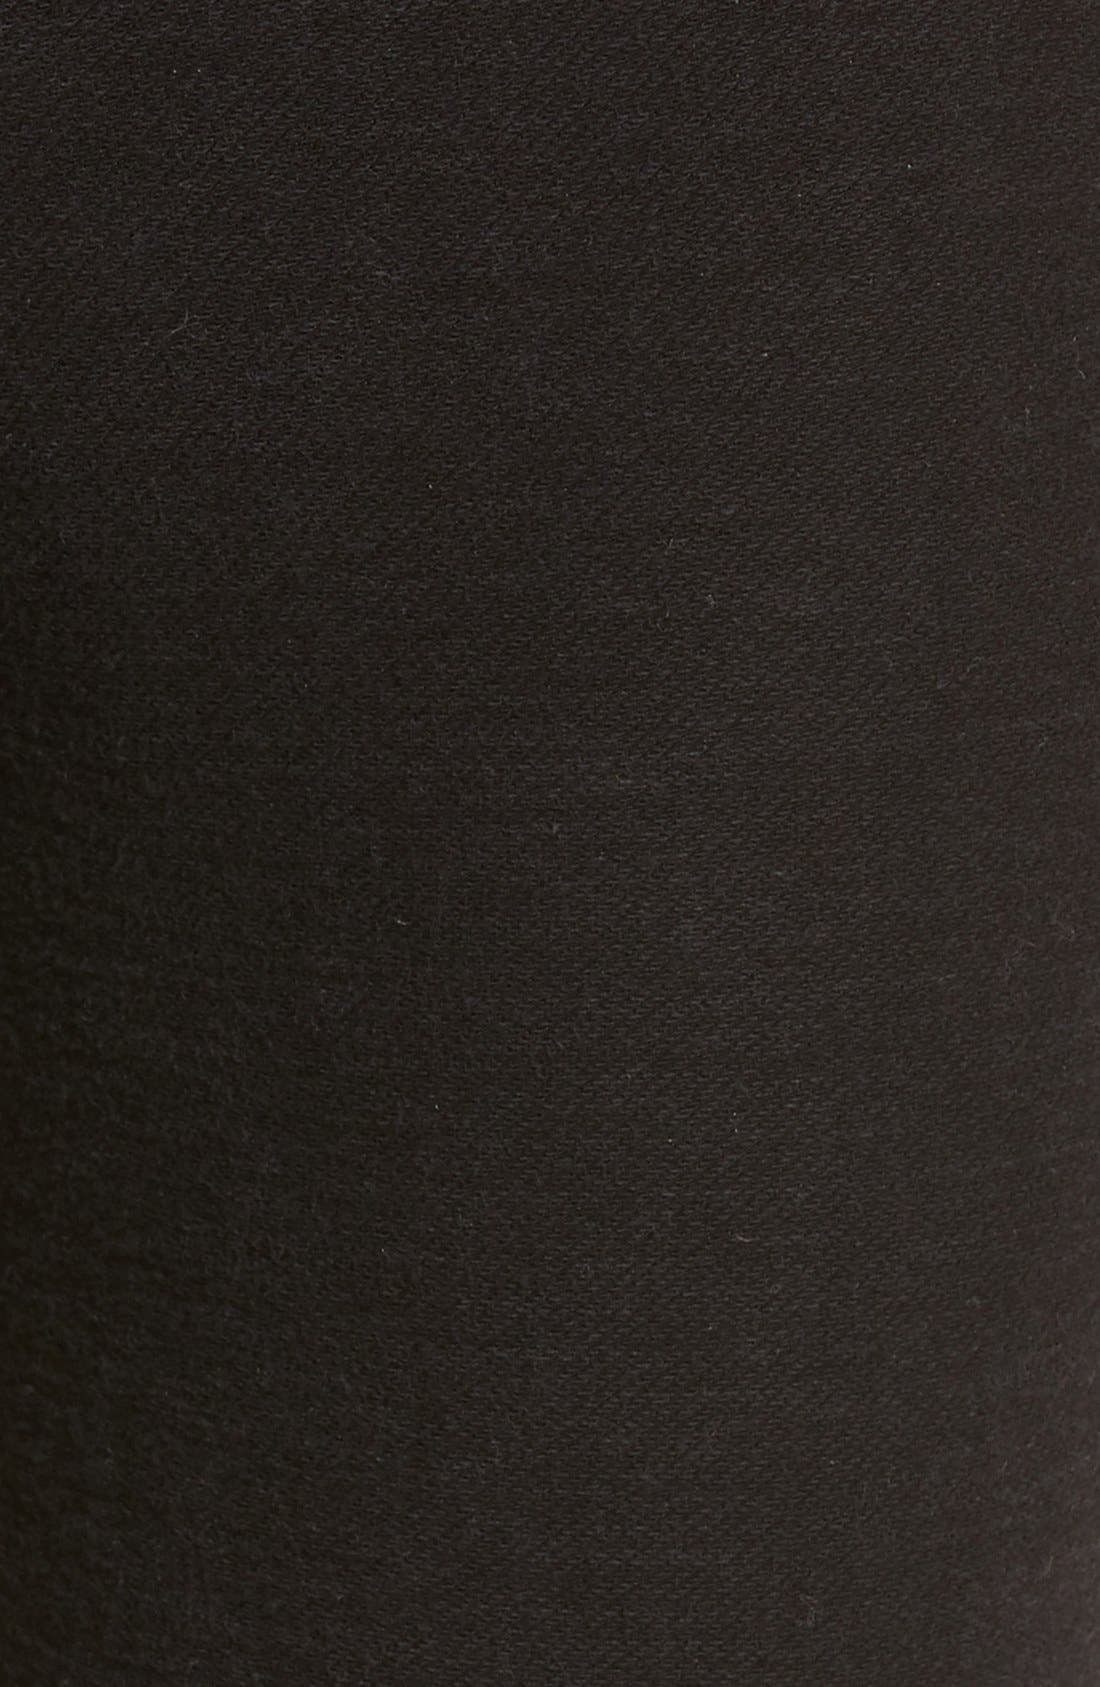 Denim Knit Skinny Jeans,                             Alternate thumbnail 4, color,                             002